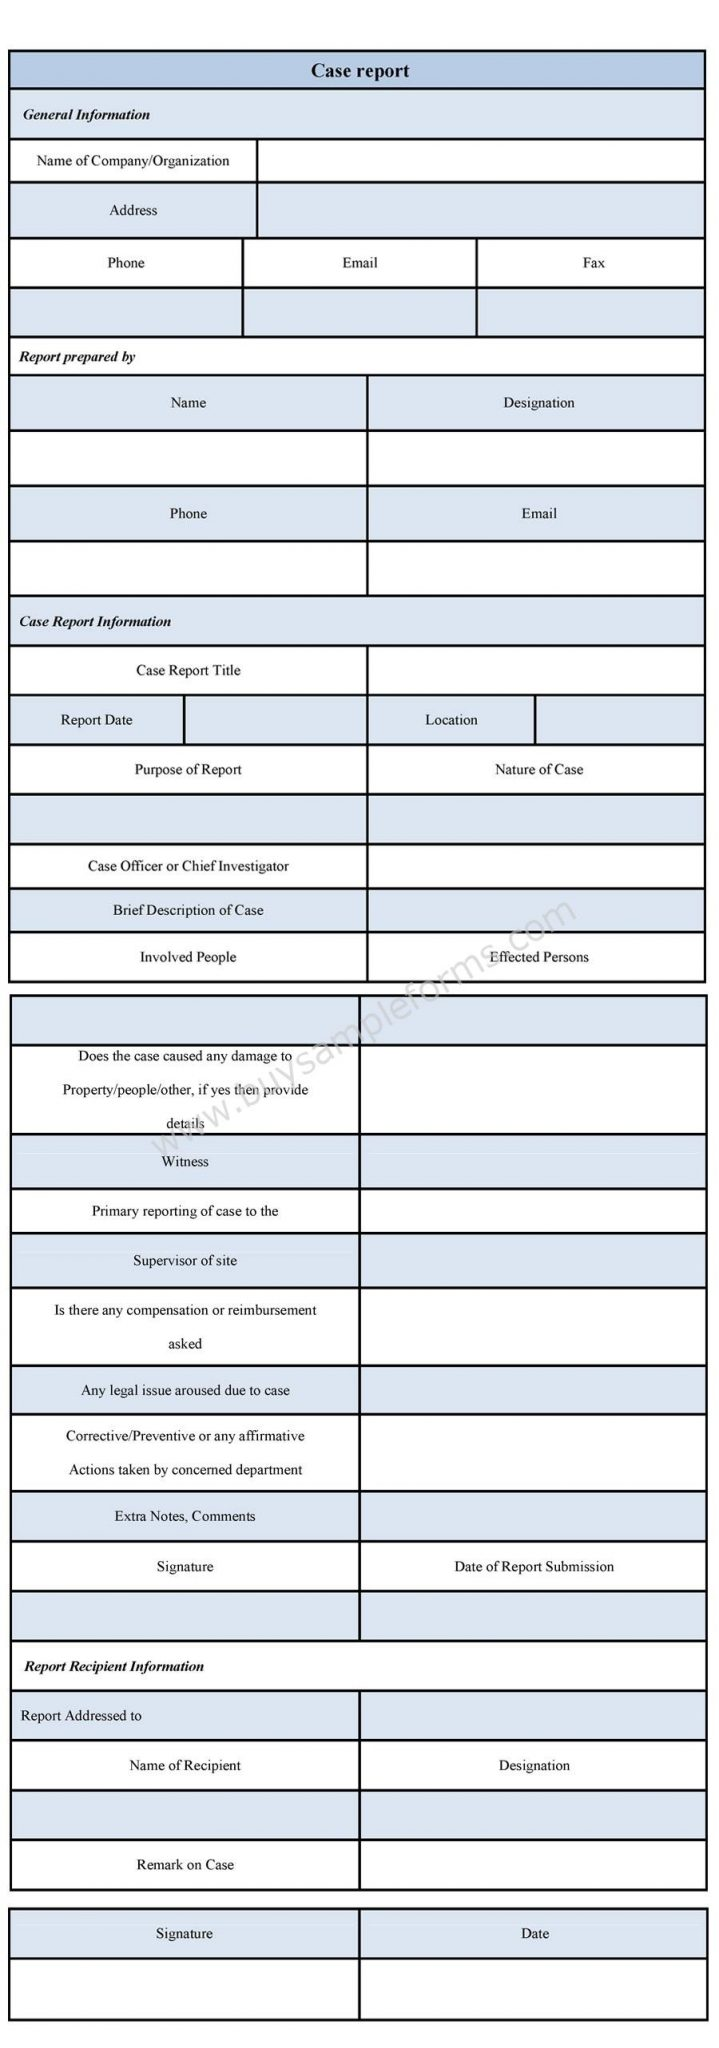 Case Report Form format